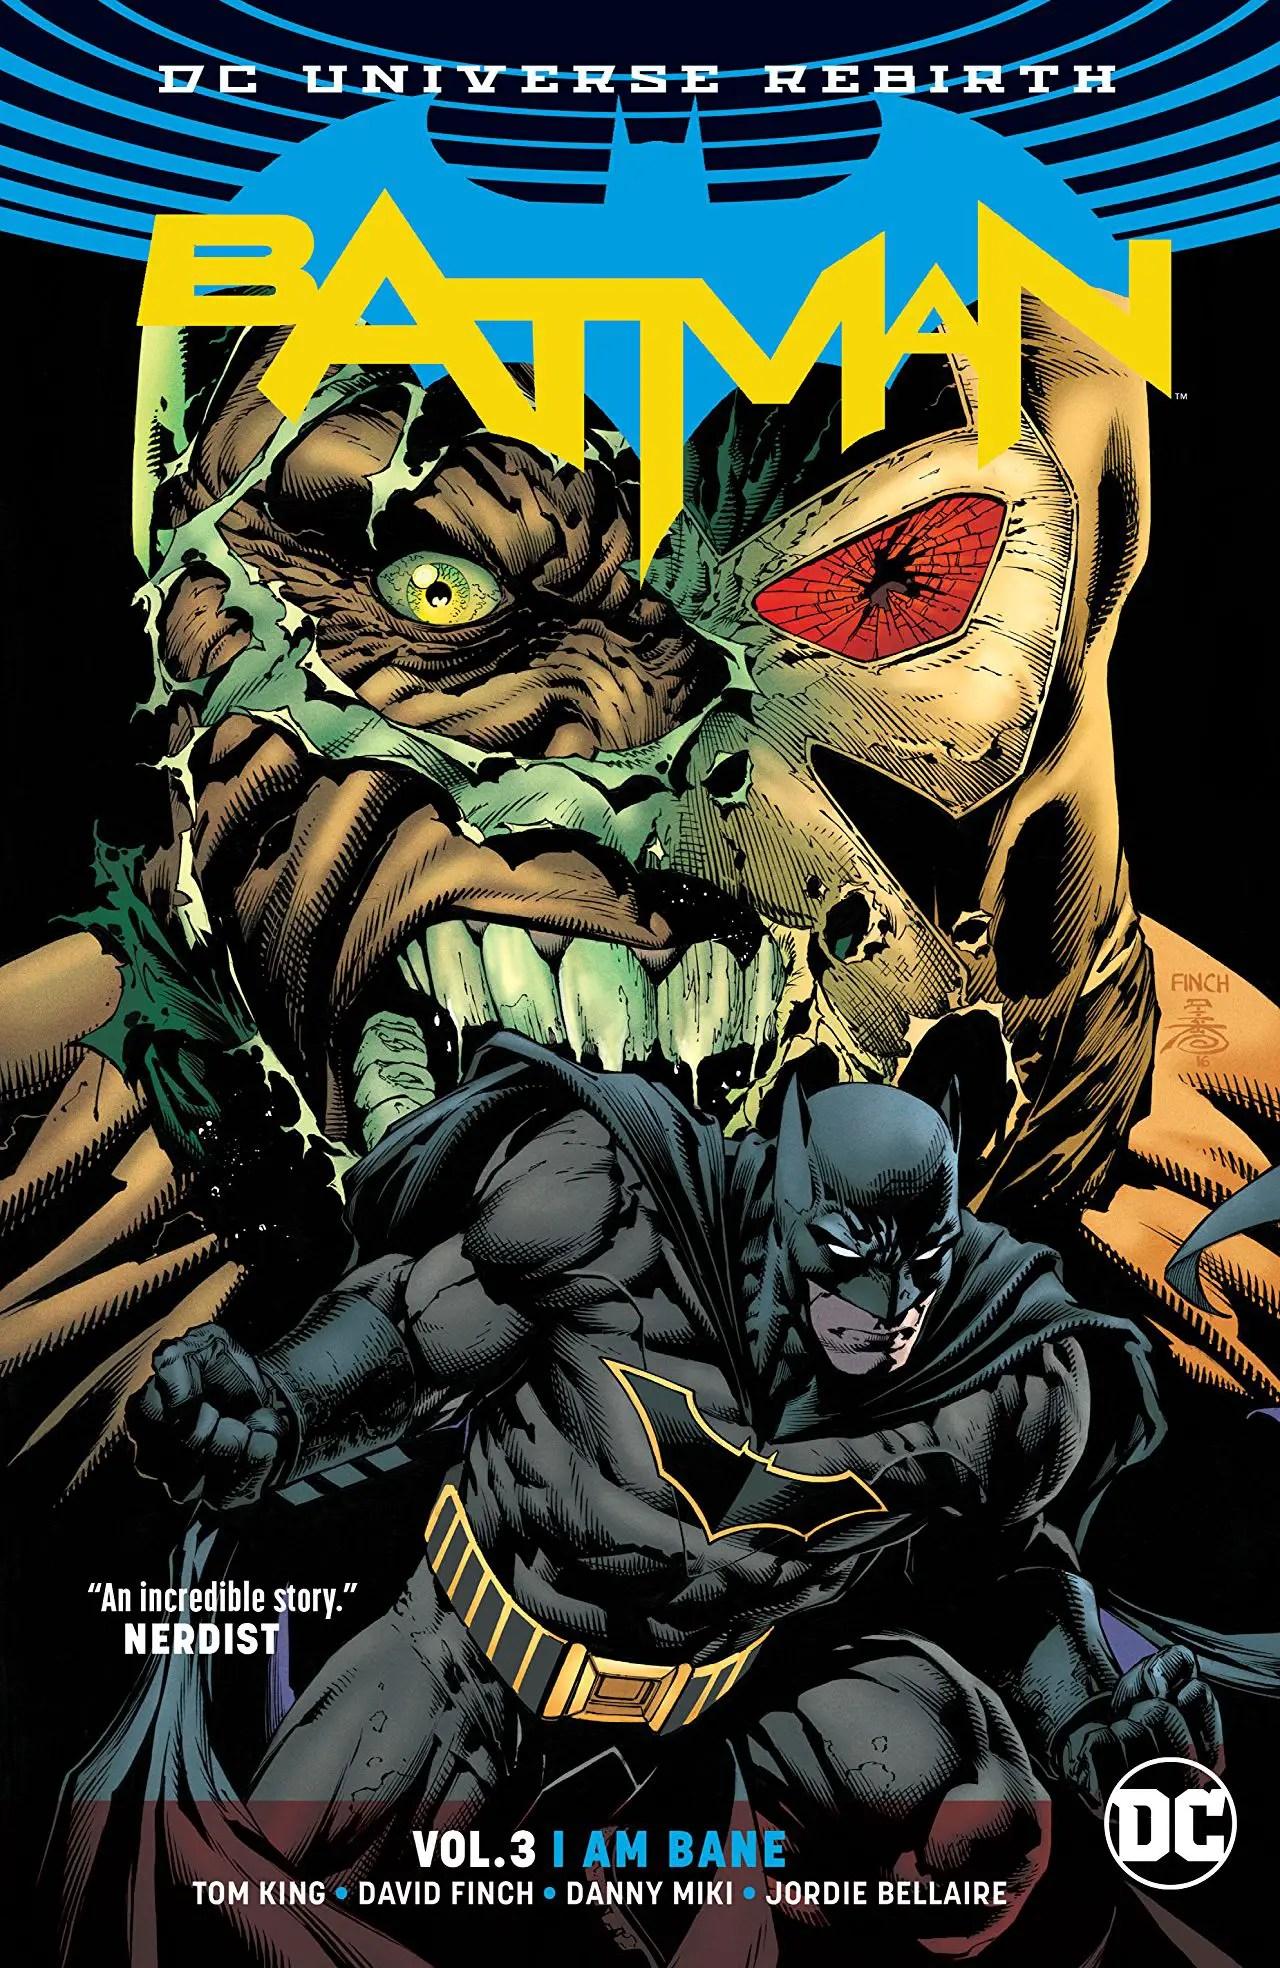 'Batman Vol. 3: I Am Bane' review: A terrific climax for the first year of Tom King's Batman run